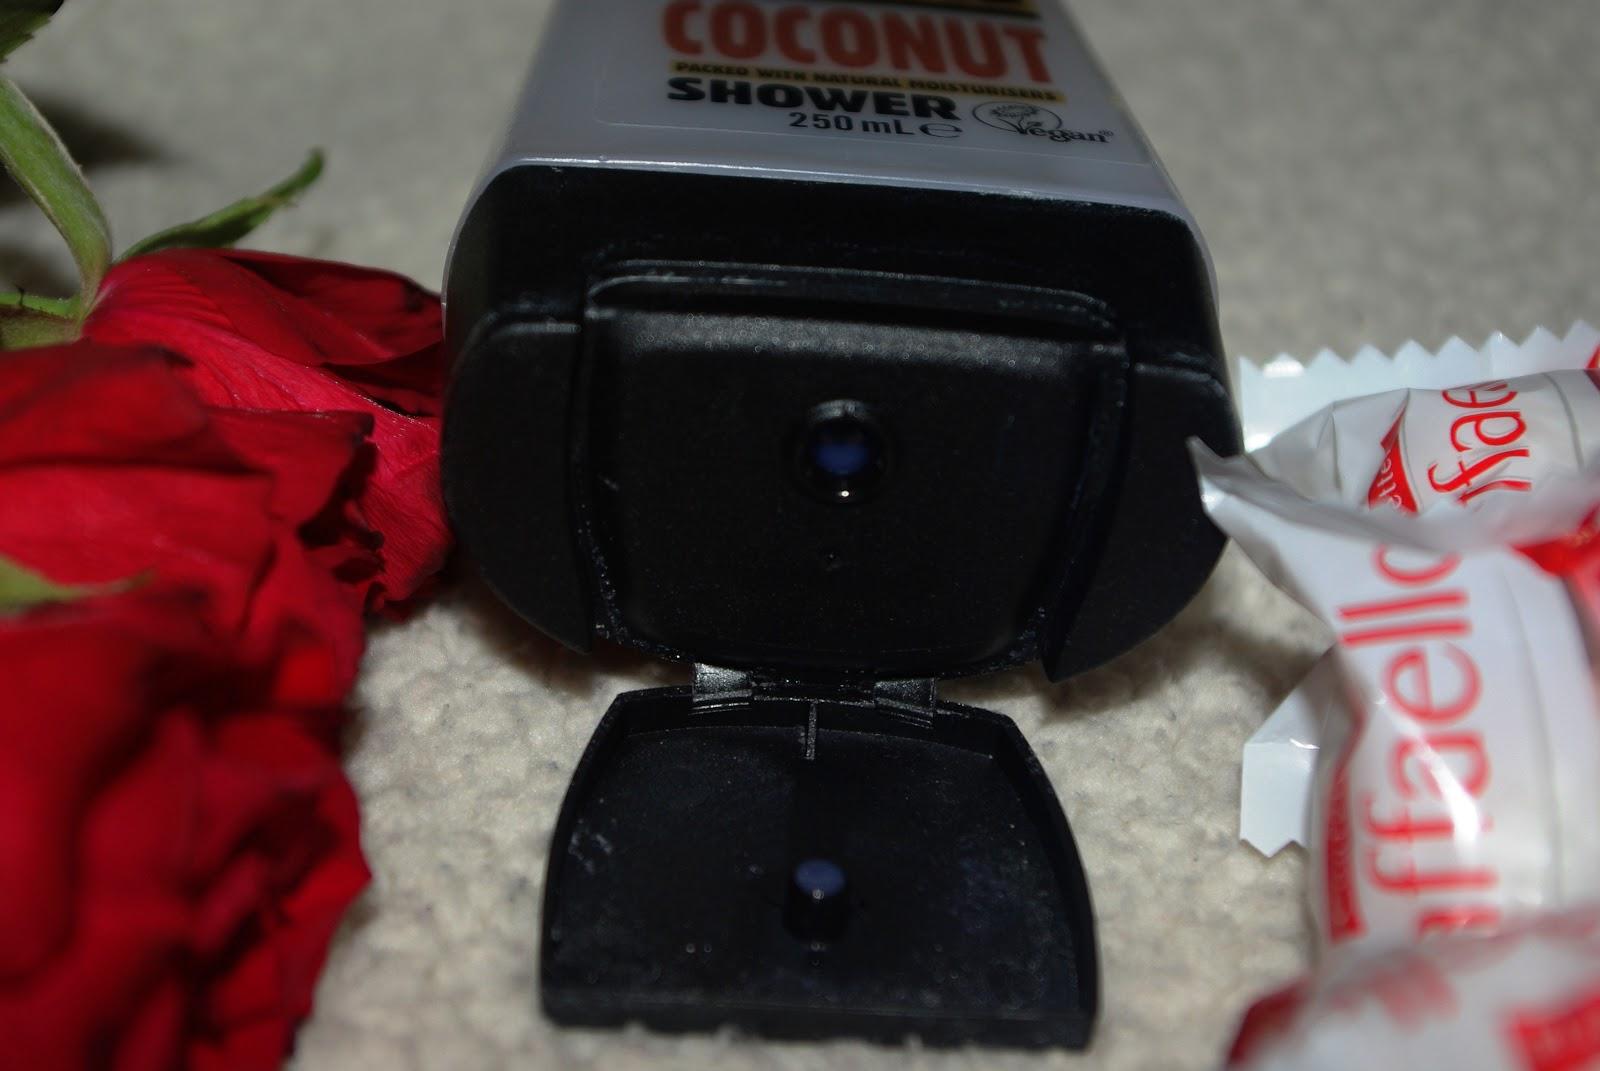 Original Source - Coconut Shower Gel